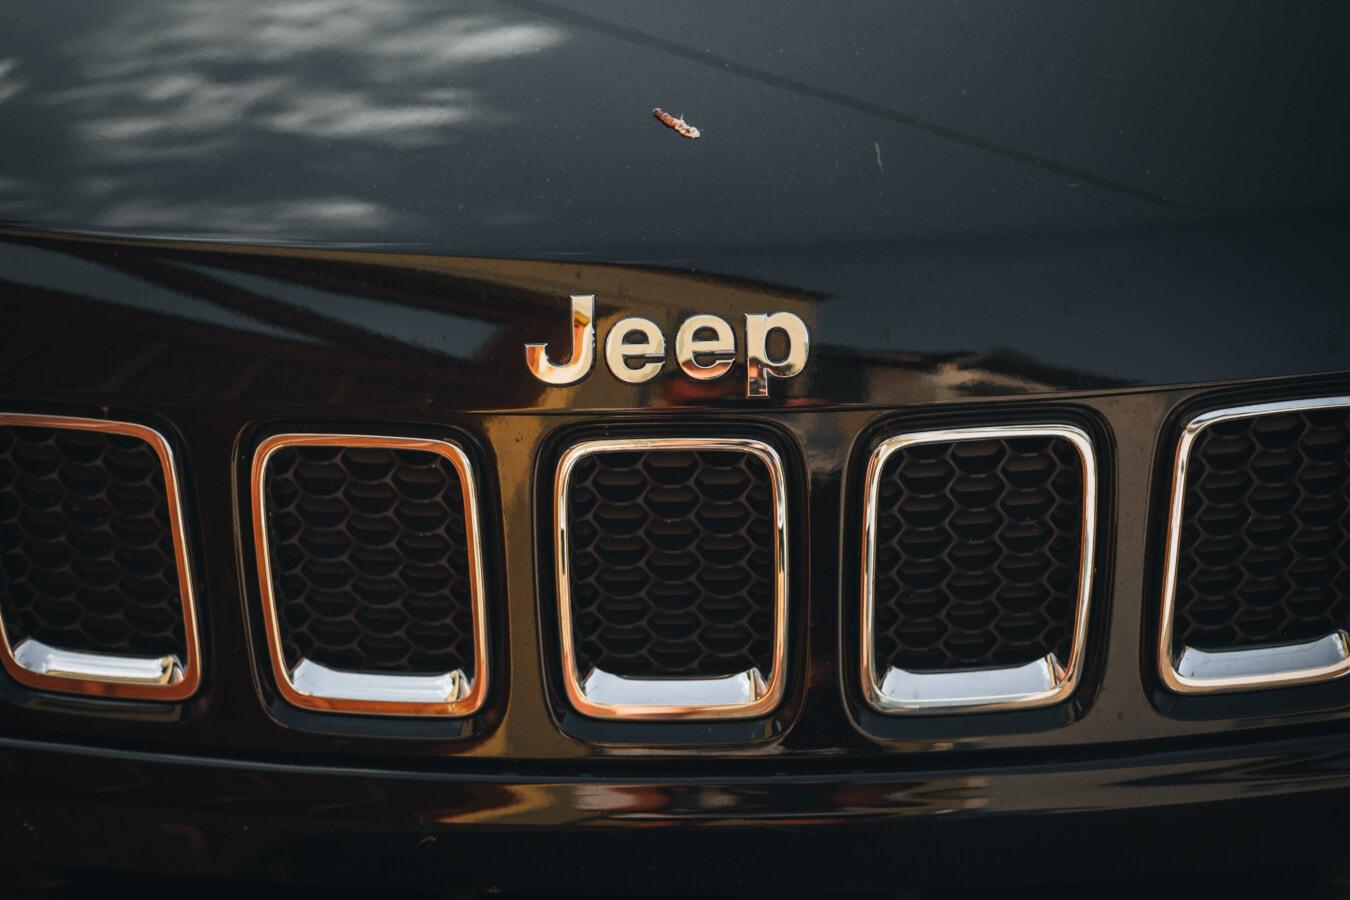 Jeep, Raster, metallische, Kühlergrill, Fahrzeug, Auto, automotive, Mustang, Chrom, Klassiker